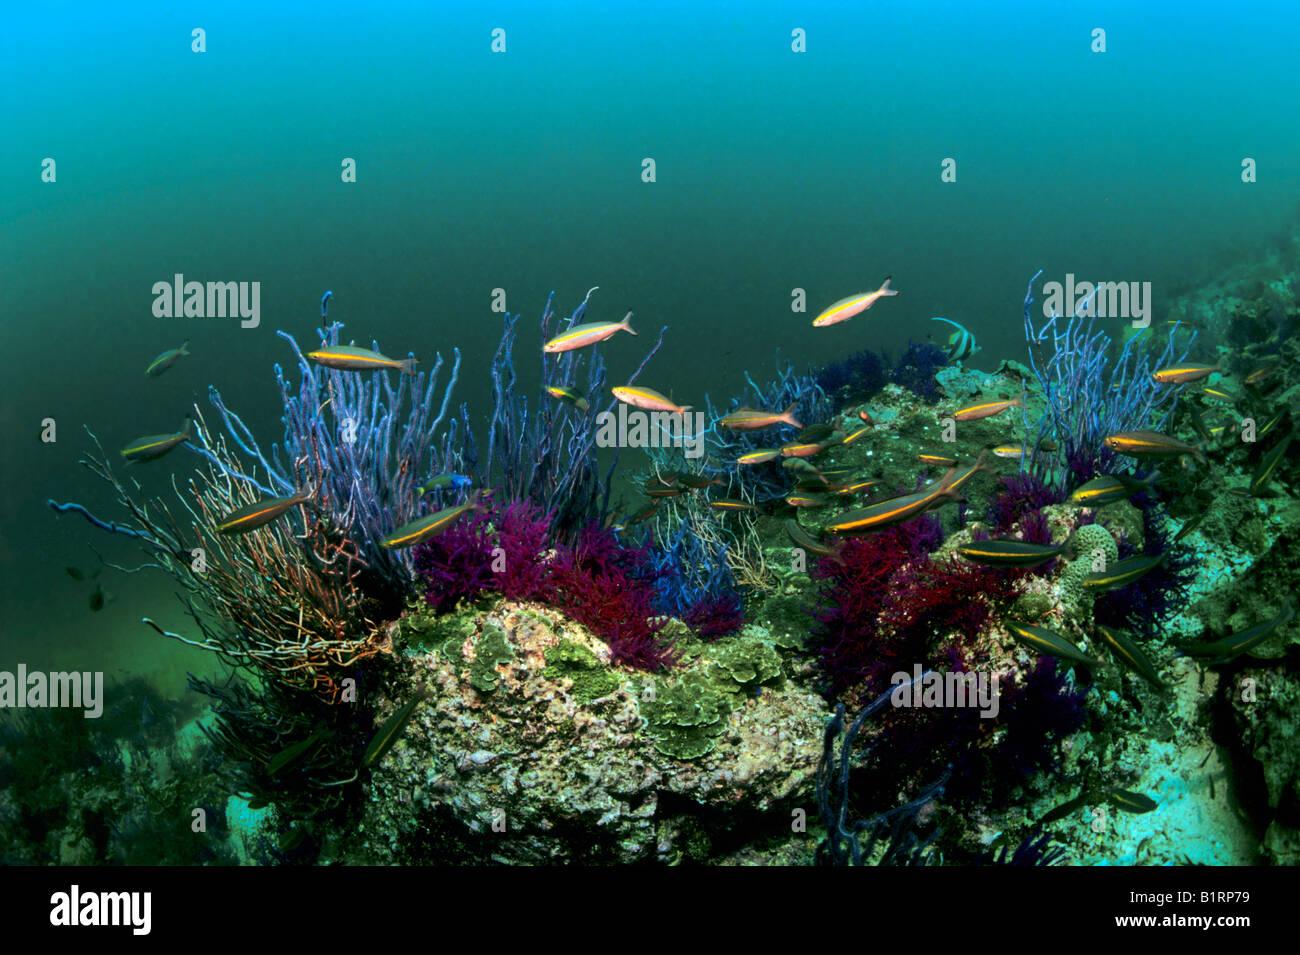 Violette Ellisella Coral (Ellisella SP.) und Gold Barr Fusilers (Pterocaesio Chrysozona) in ein Unterwasser-Szene, Stockbild